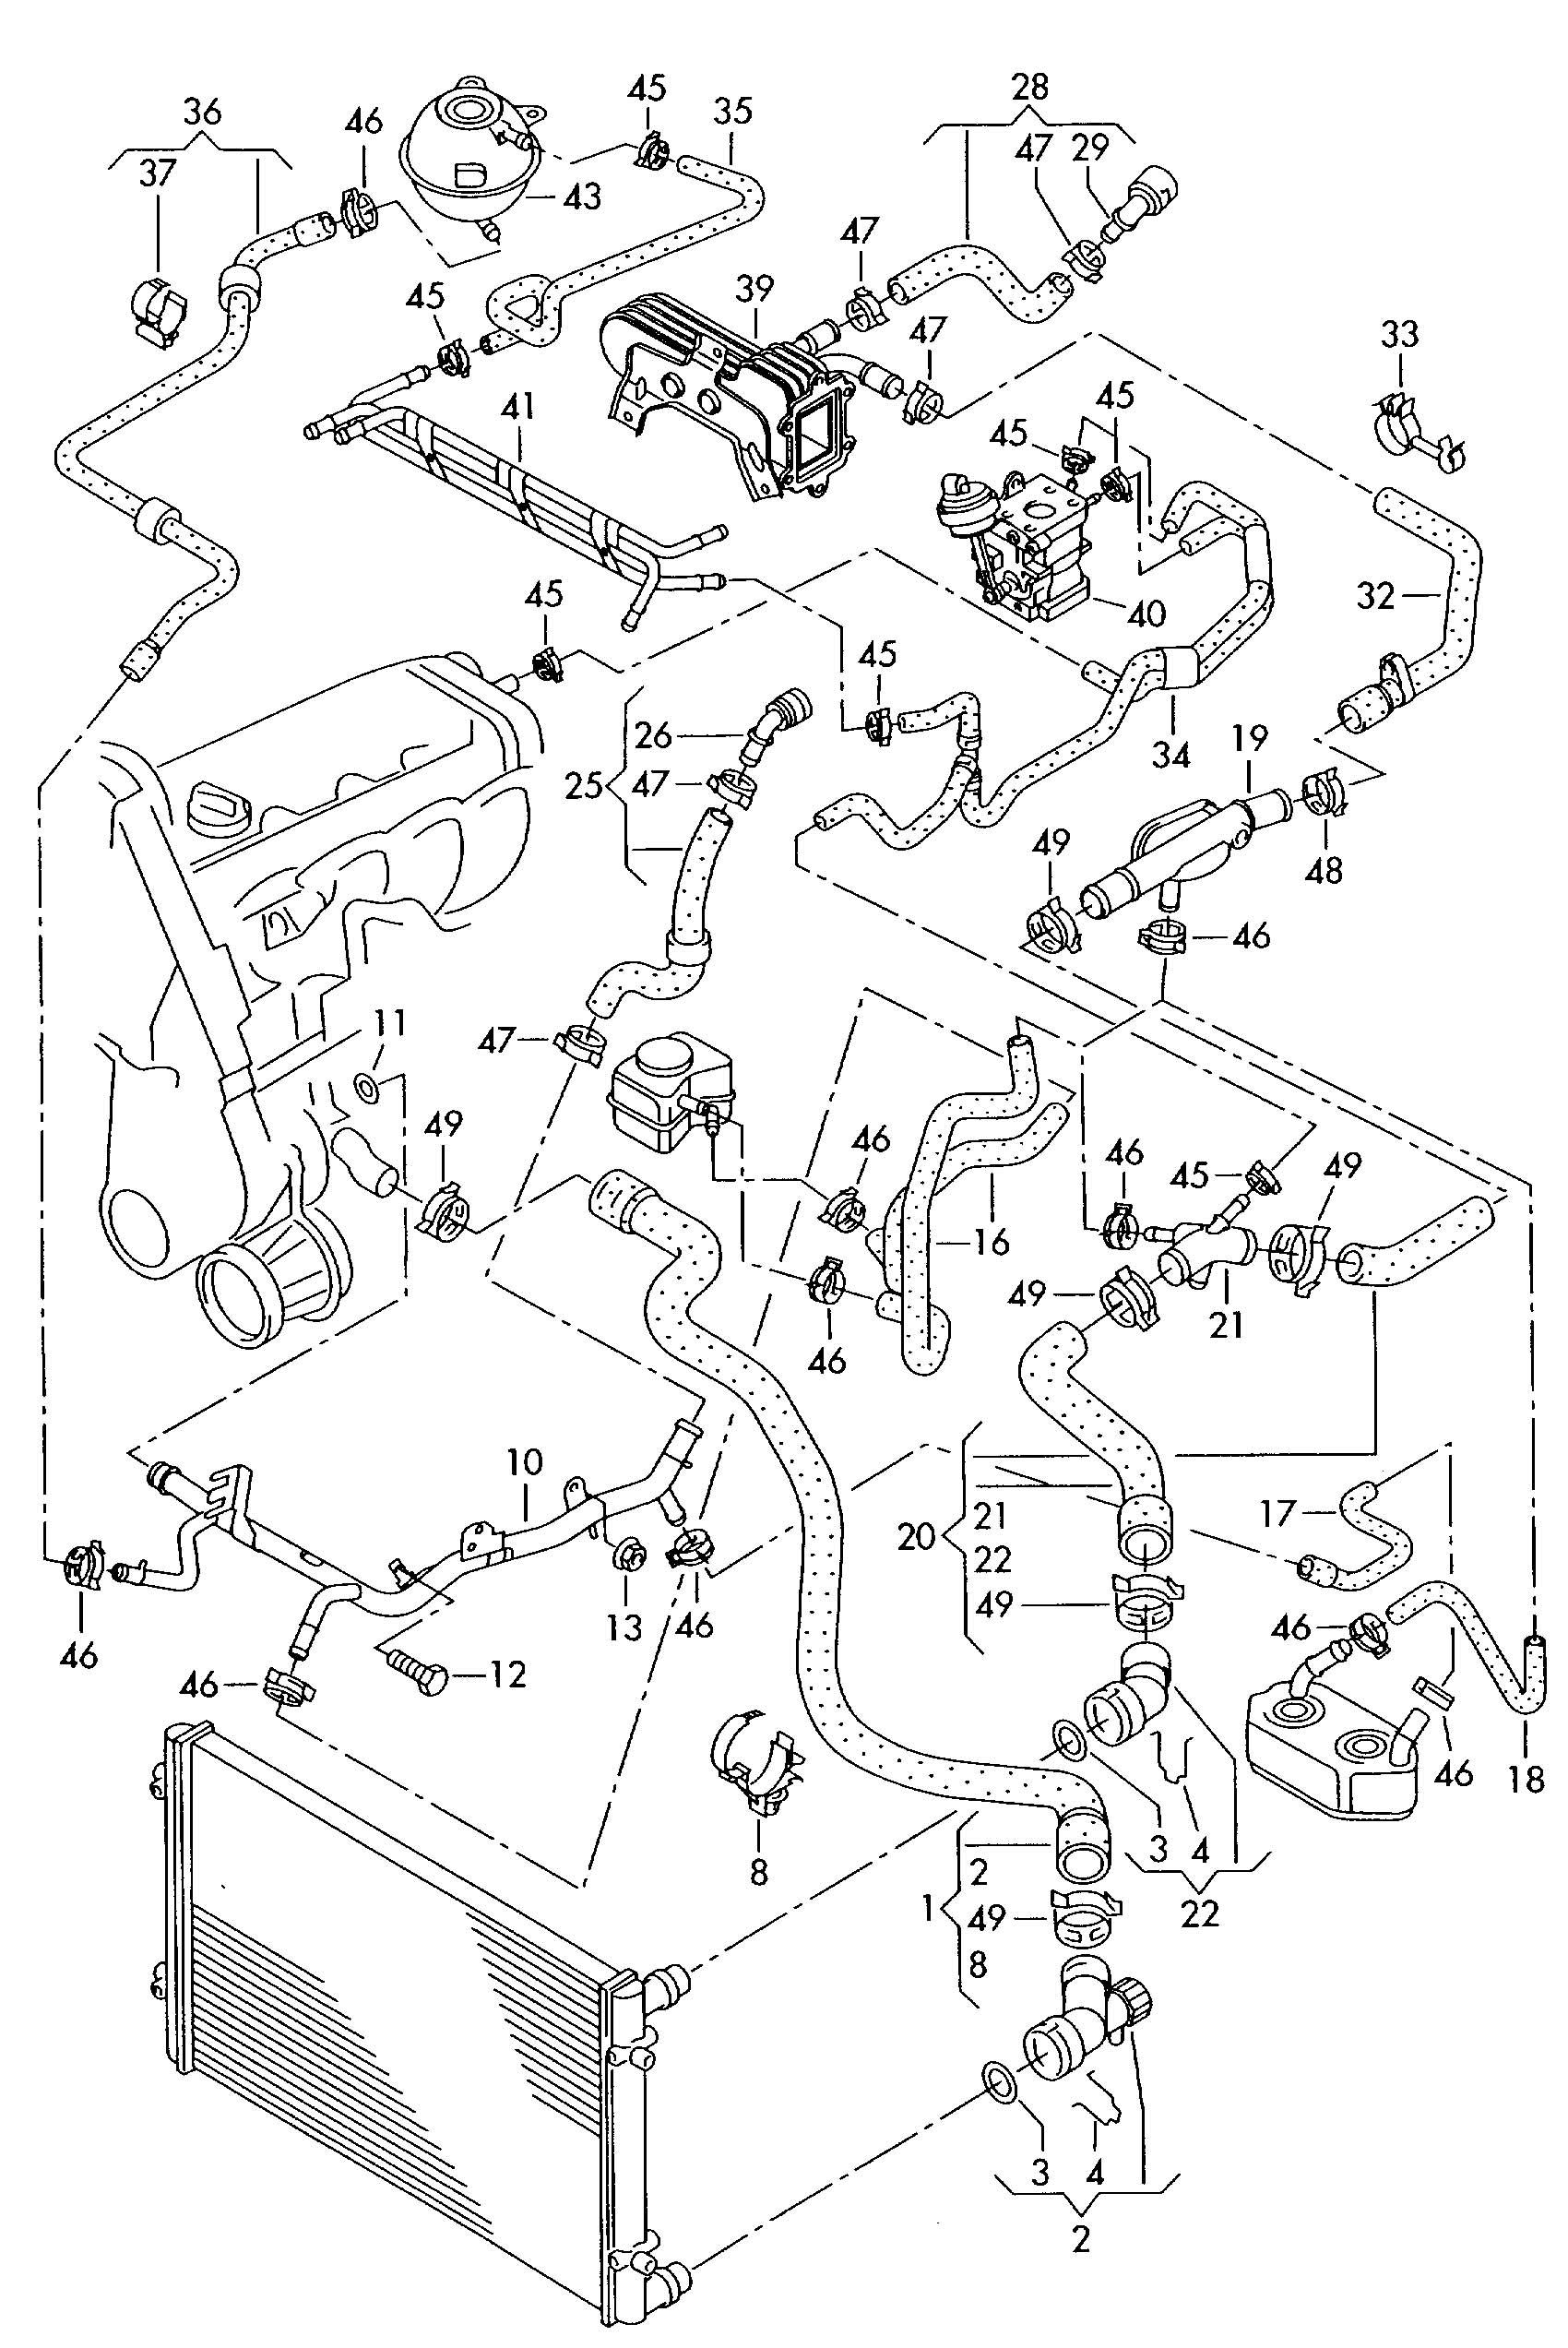 2007 Volkswagen New Beetle Water hose (coolant radiator